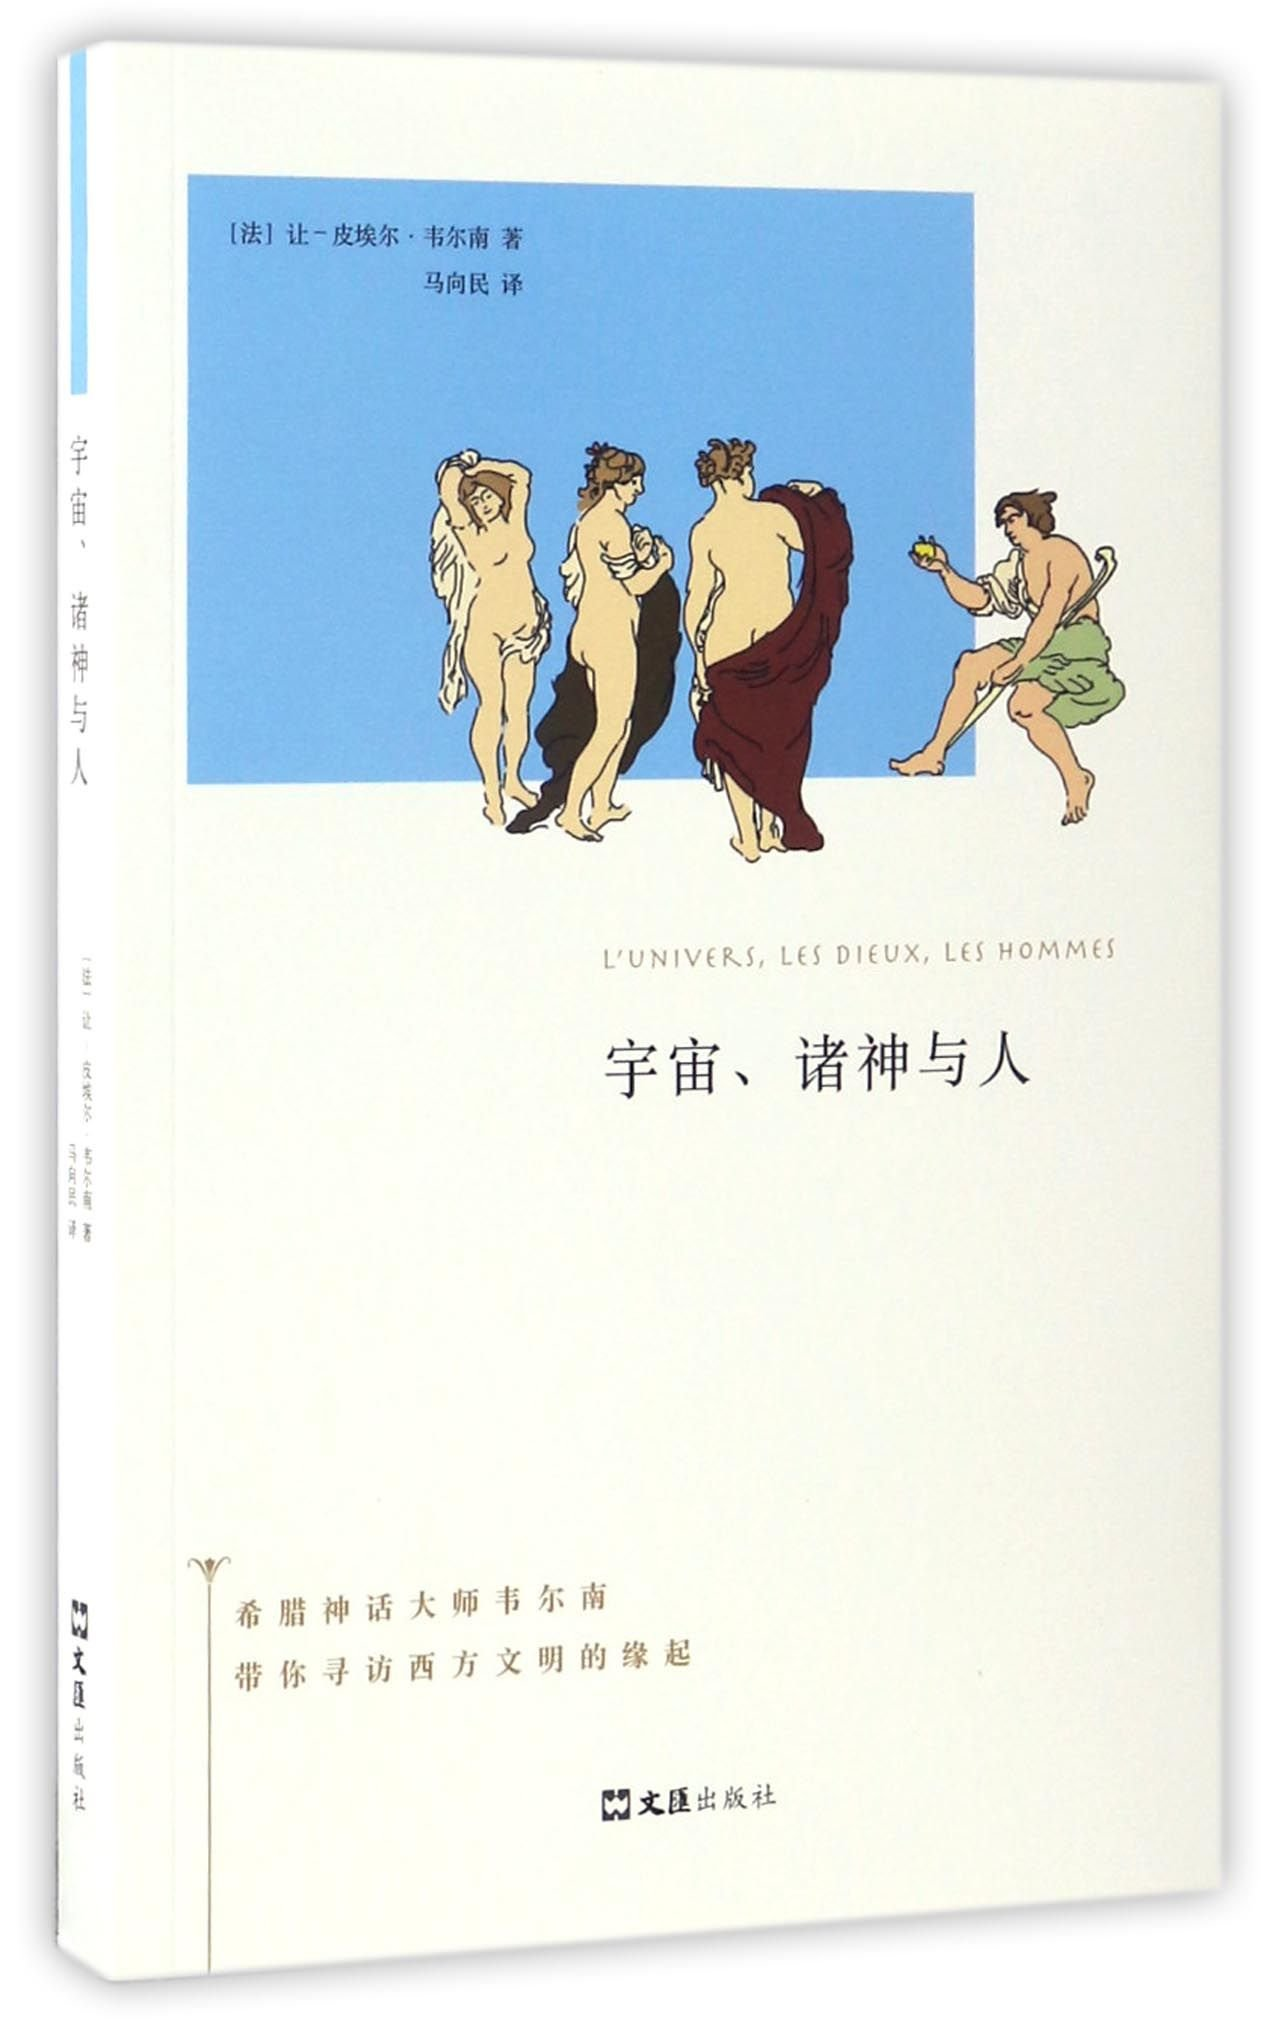 L'Univers, Les Dieux, Les Hommes (The Universe, the Gods, and Men) (Chinese Edition) pdf